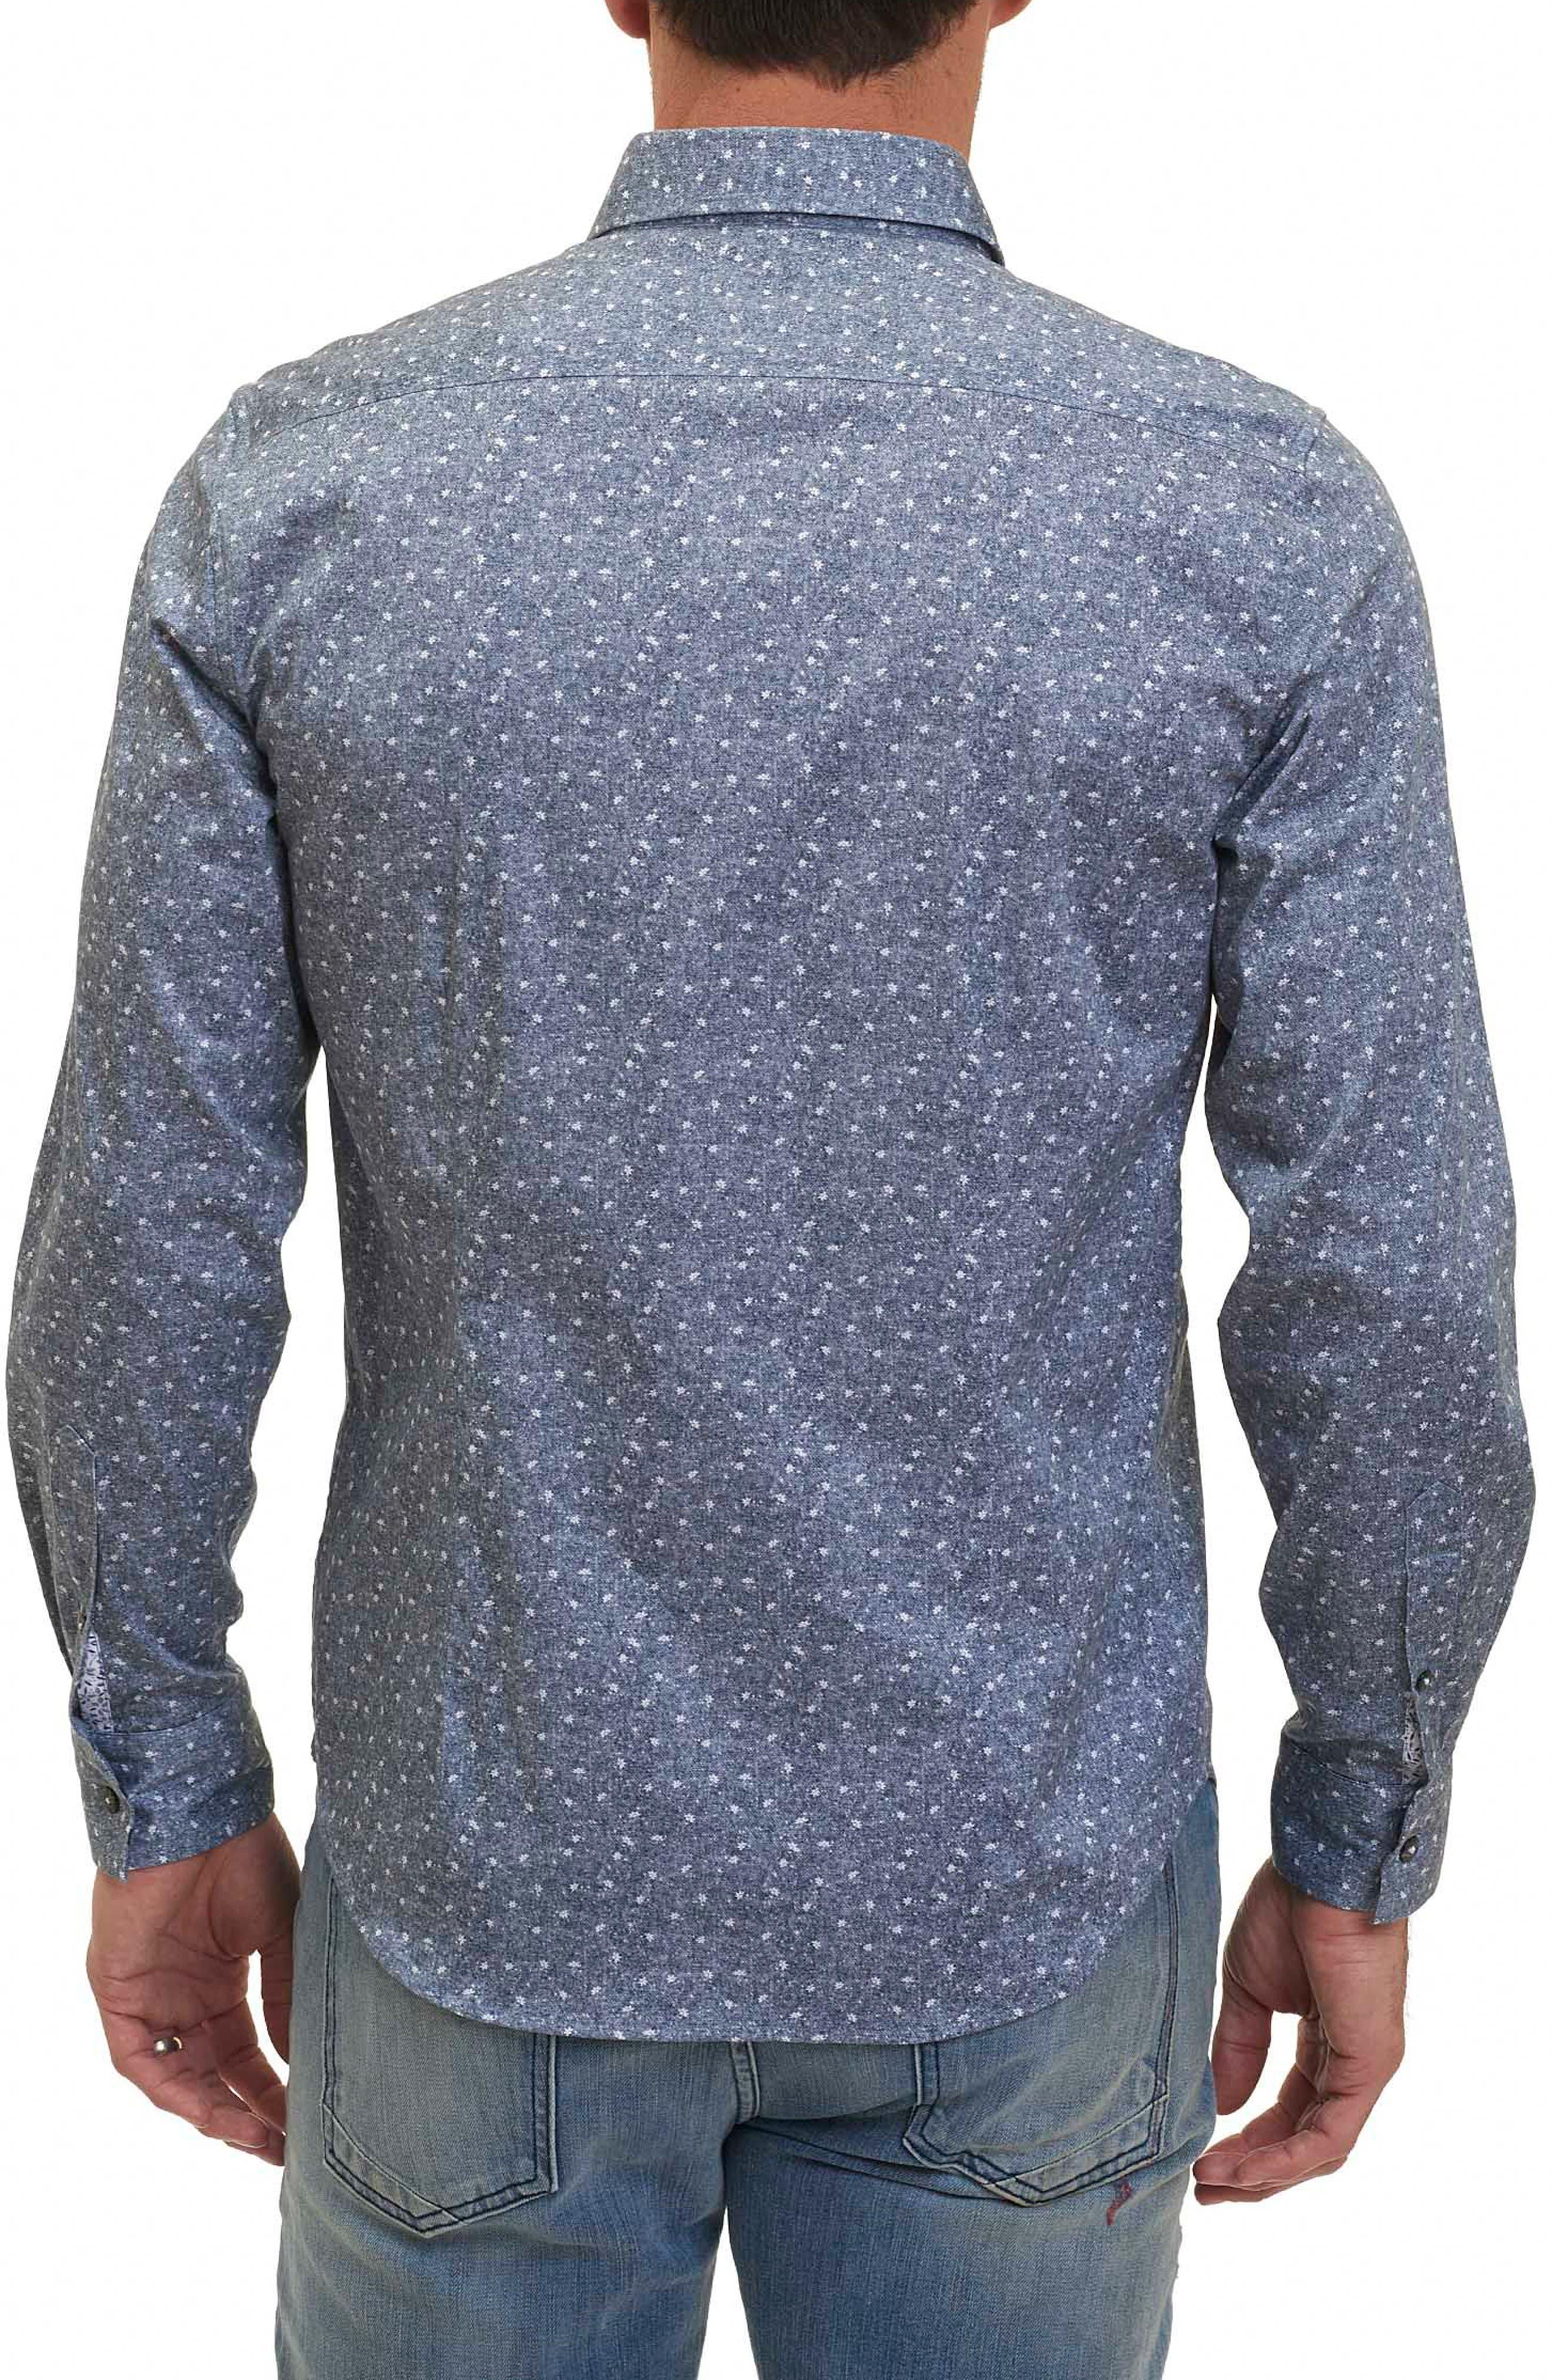 Zander Tailored Fit Sport Shirt,                             Alternate thumbnail 2, color,                             020